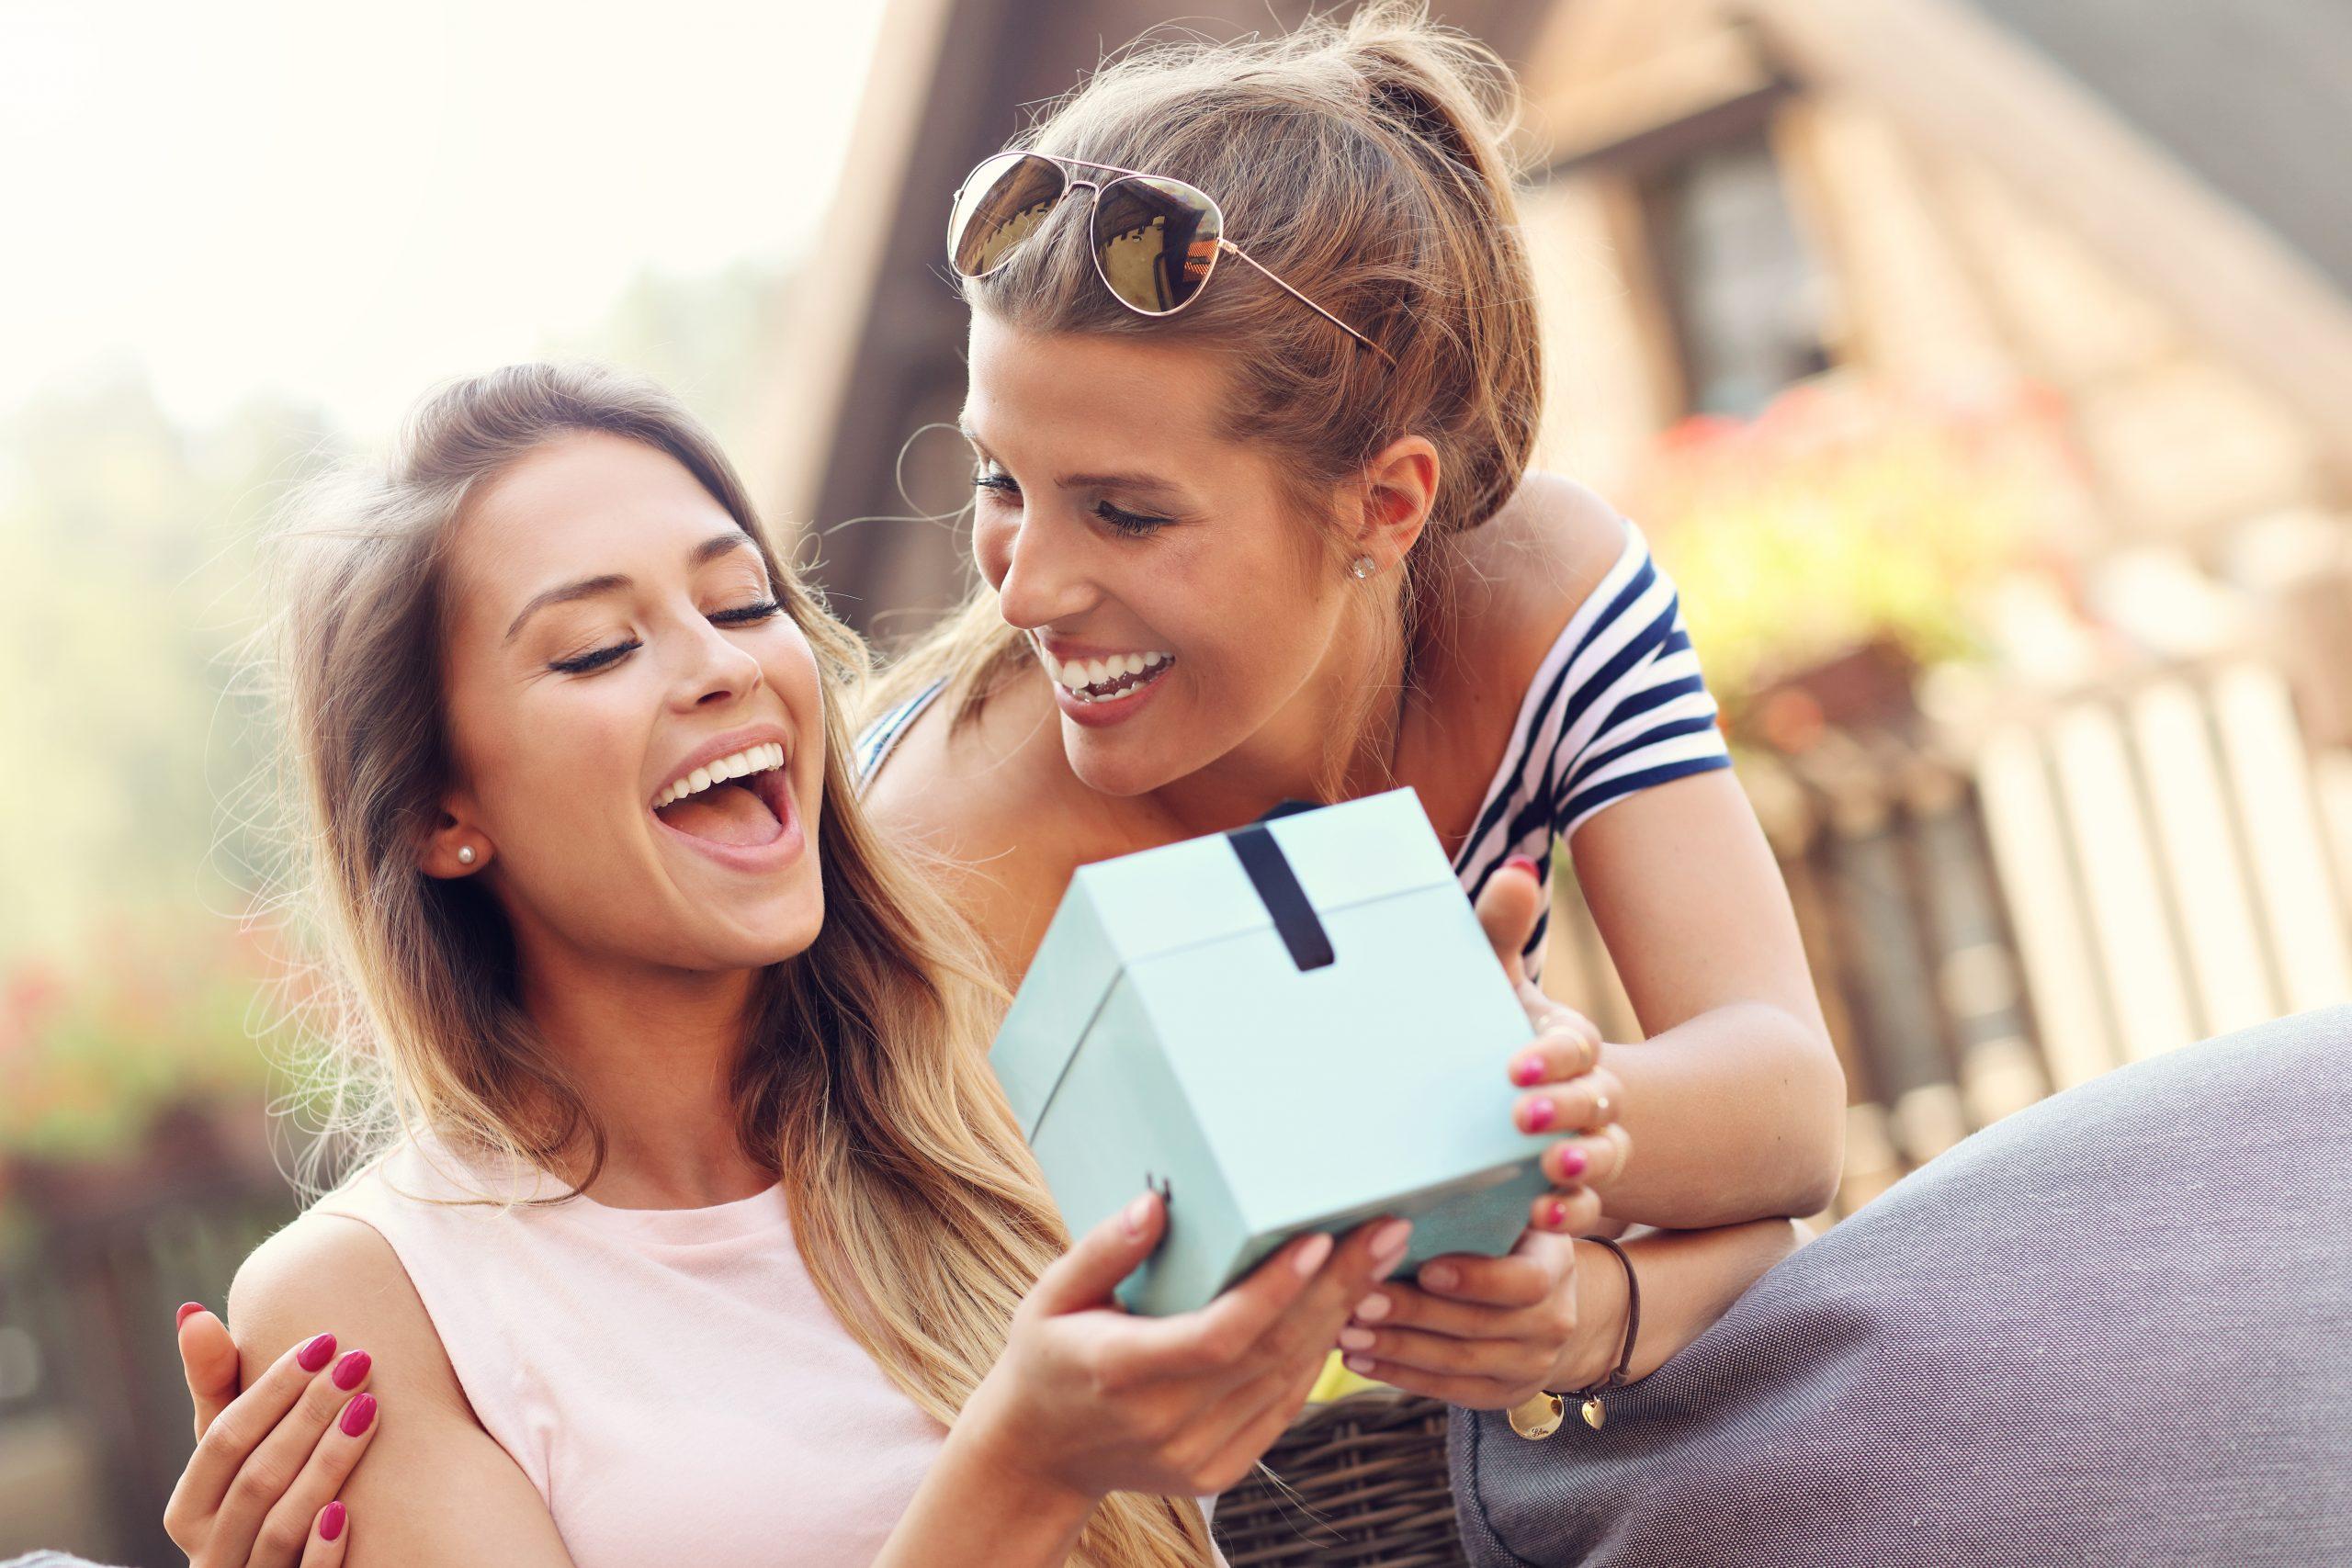 Freundin überreicht Geschenk an Freundin